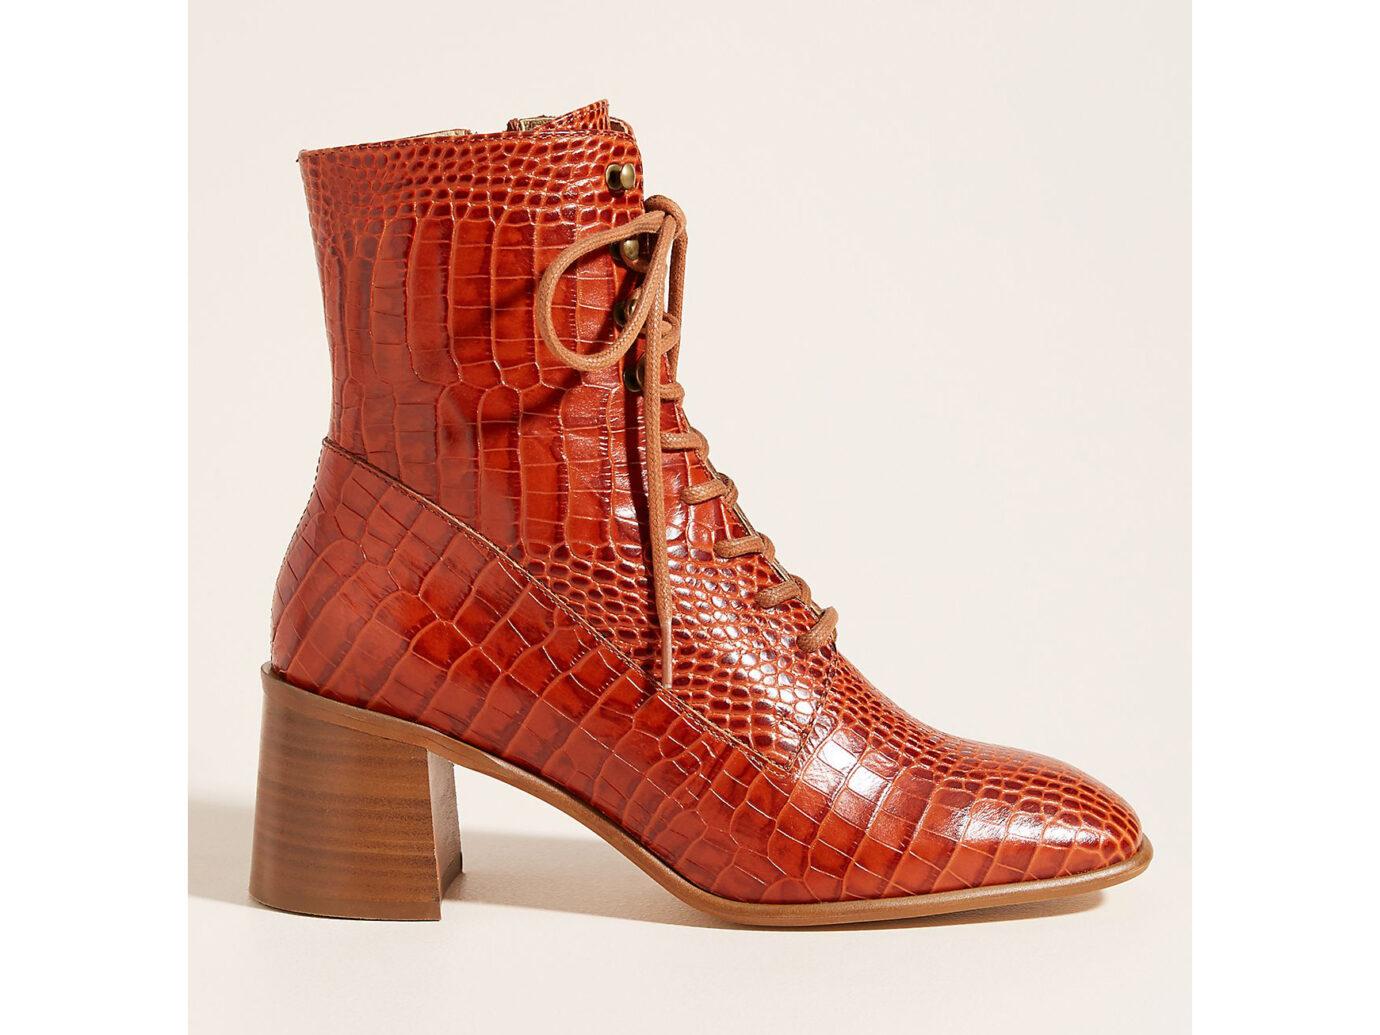 Anthropologie Miista Emmat Ankle Boot